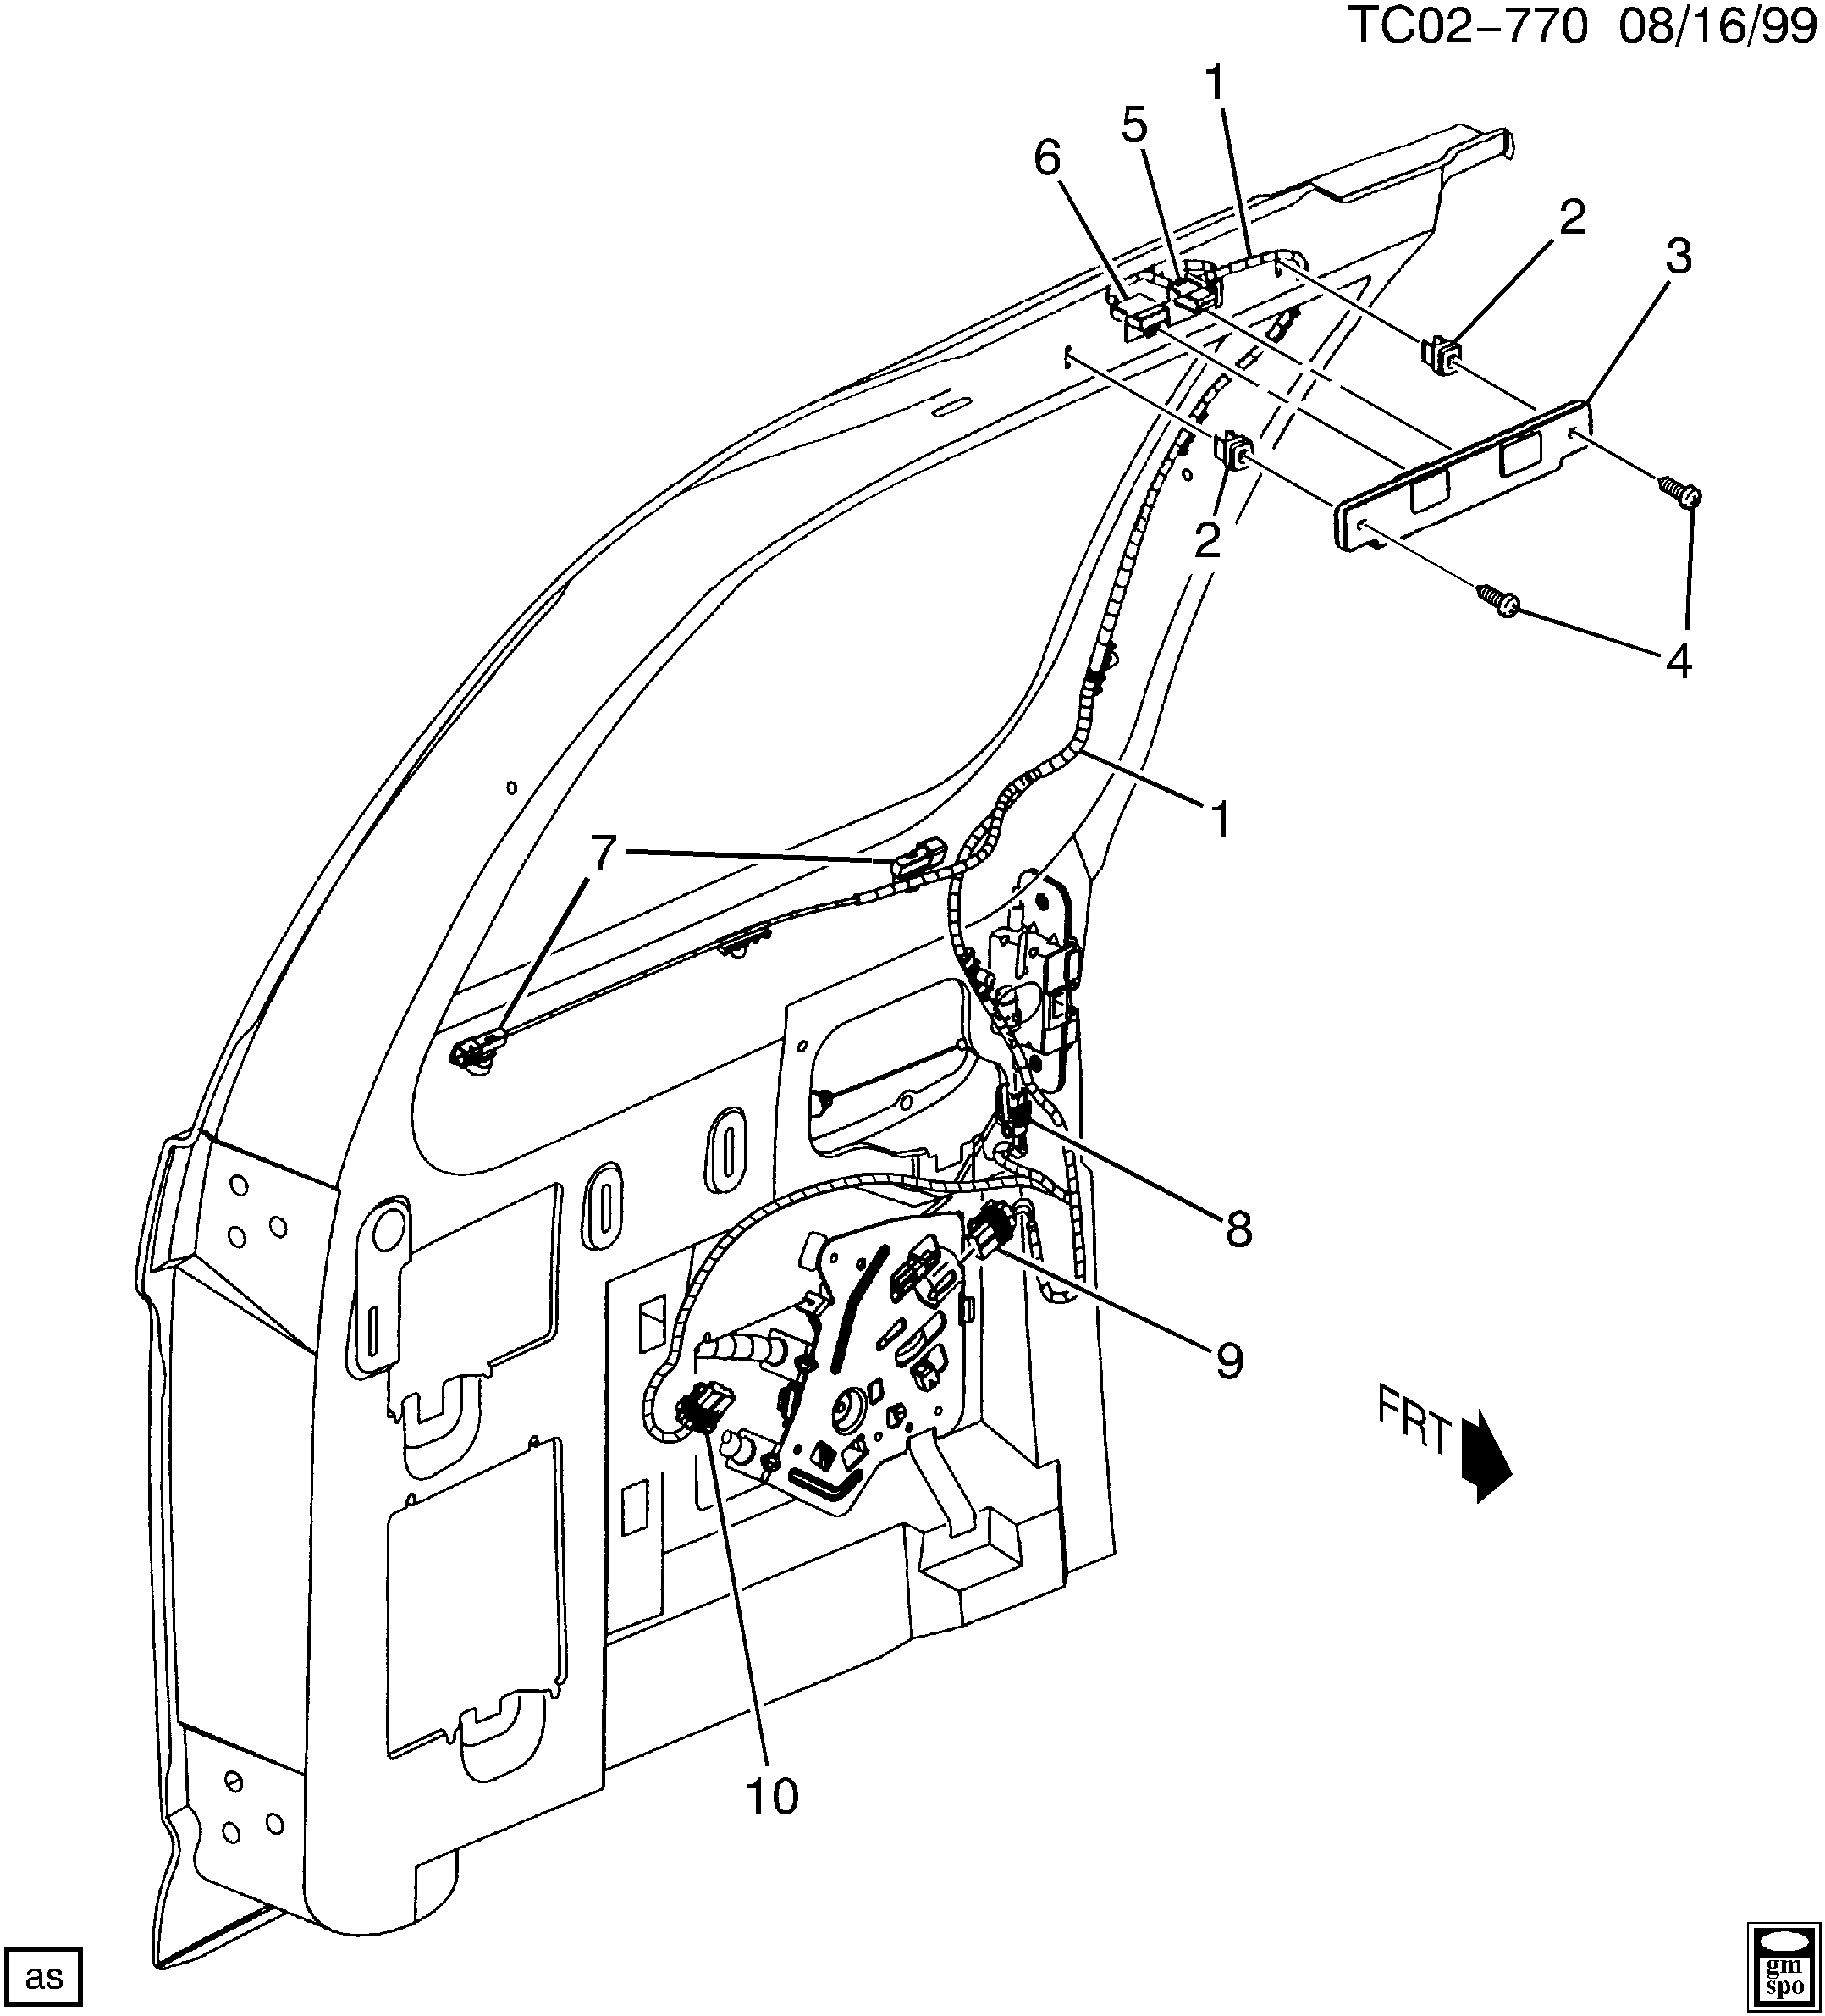 GMC SIERRA 1500 - 03,43,53 Bodystyle (2WD) / Spare parts catalog EPC